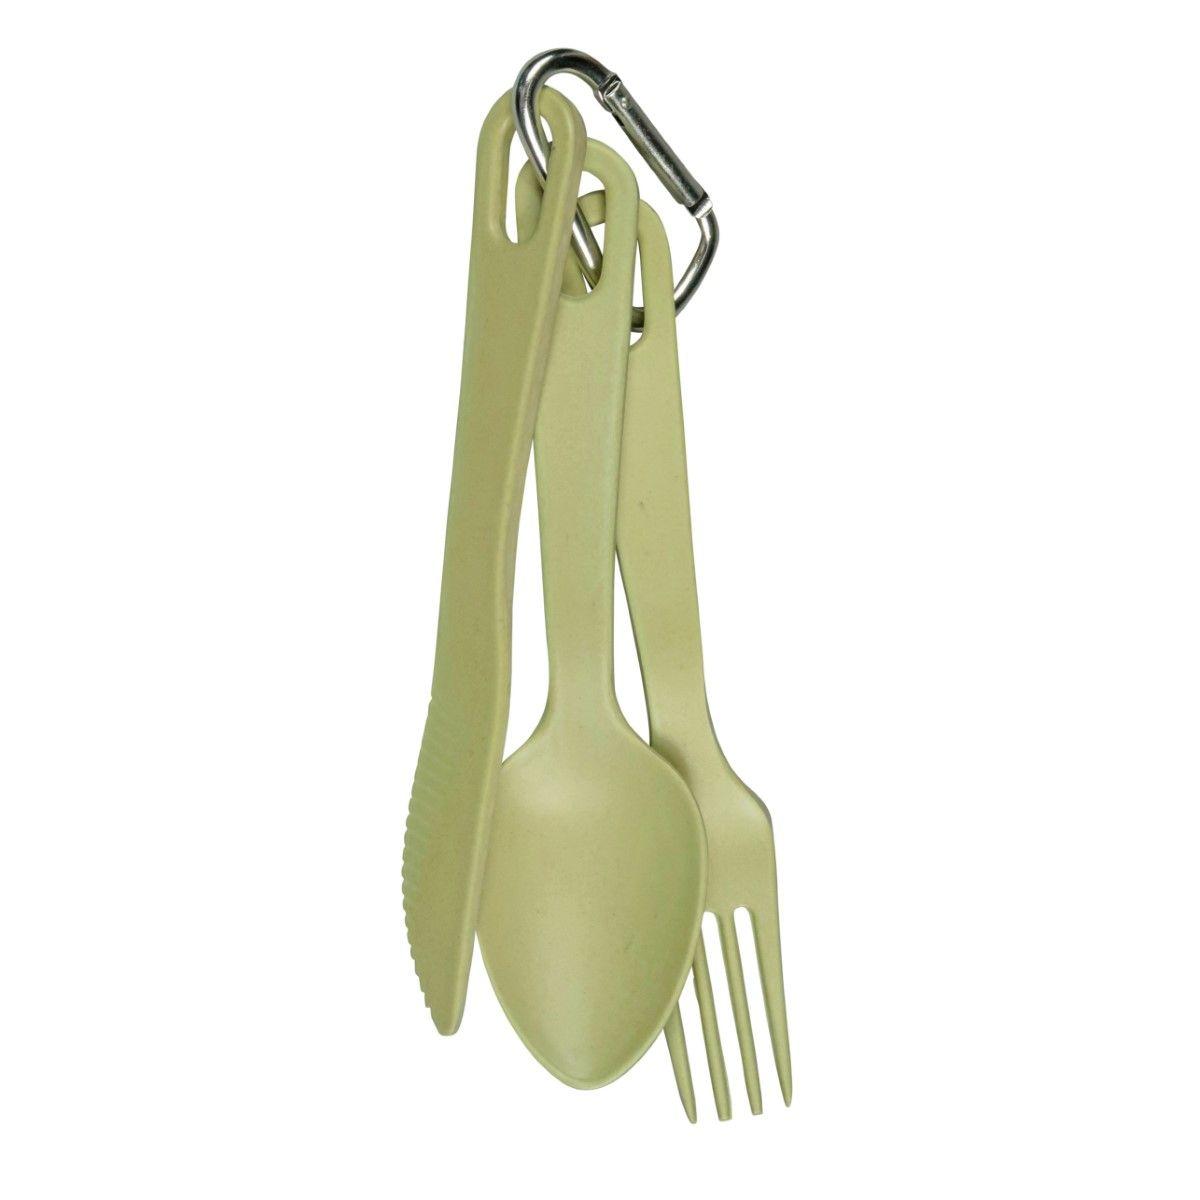 Capventure Take 3 Cutlery Set Willow Green [Set of 3]